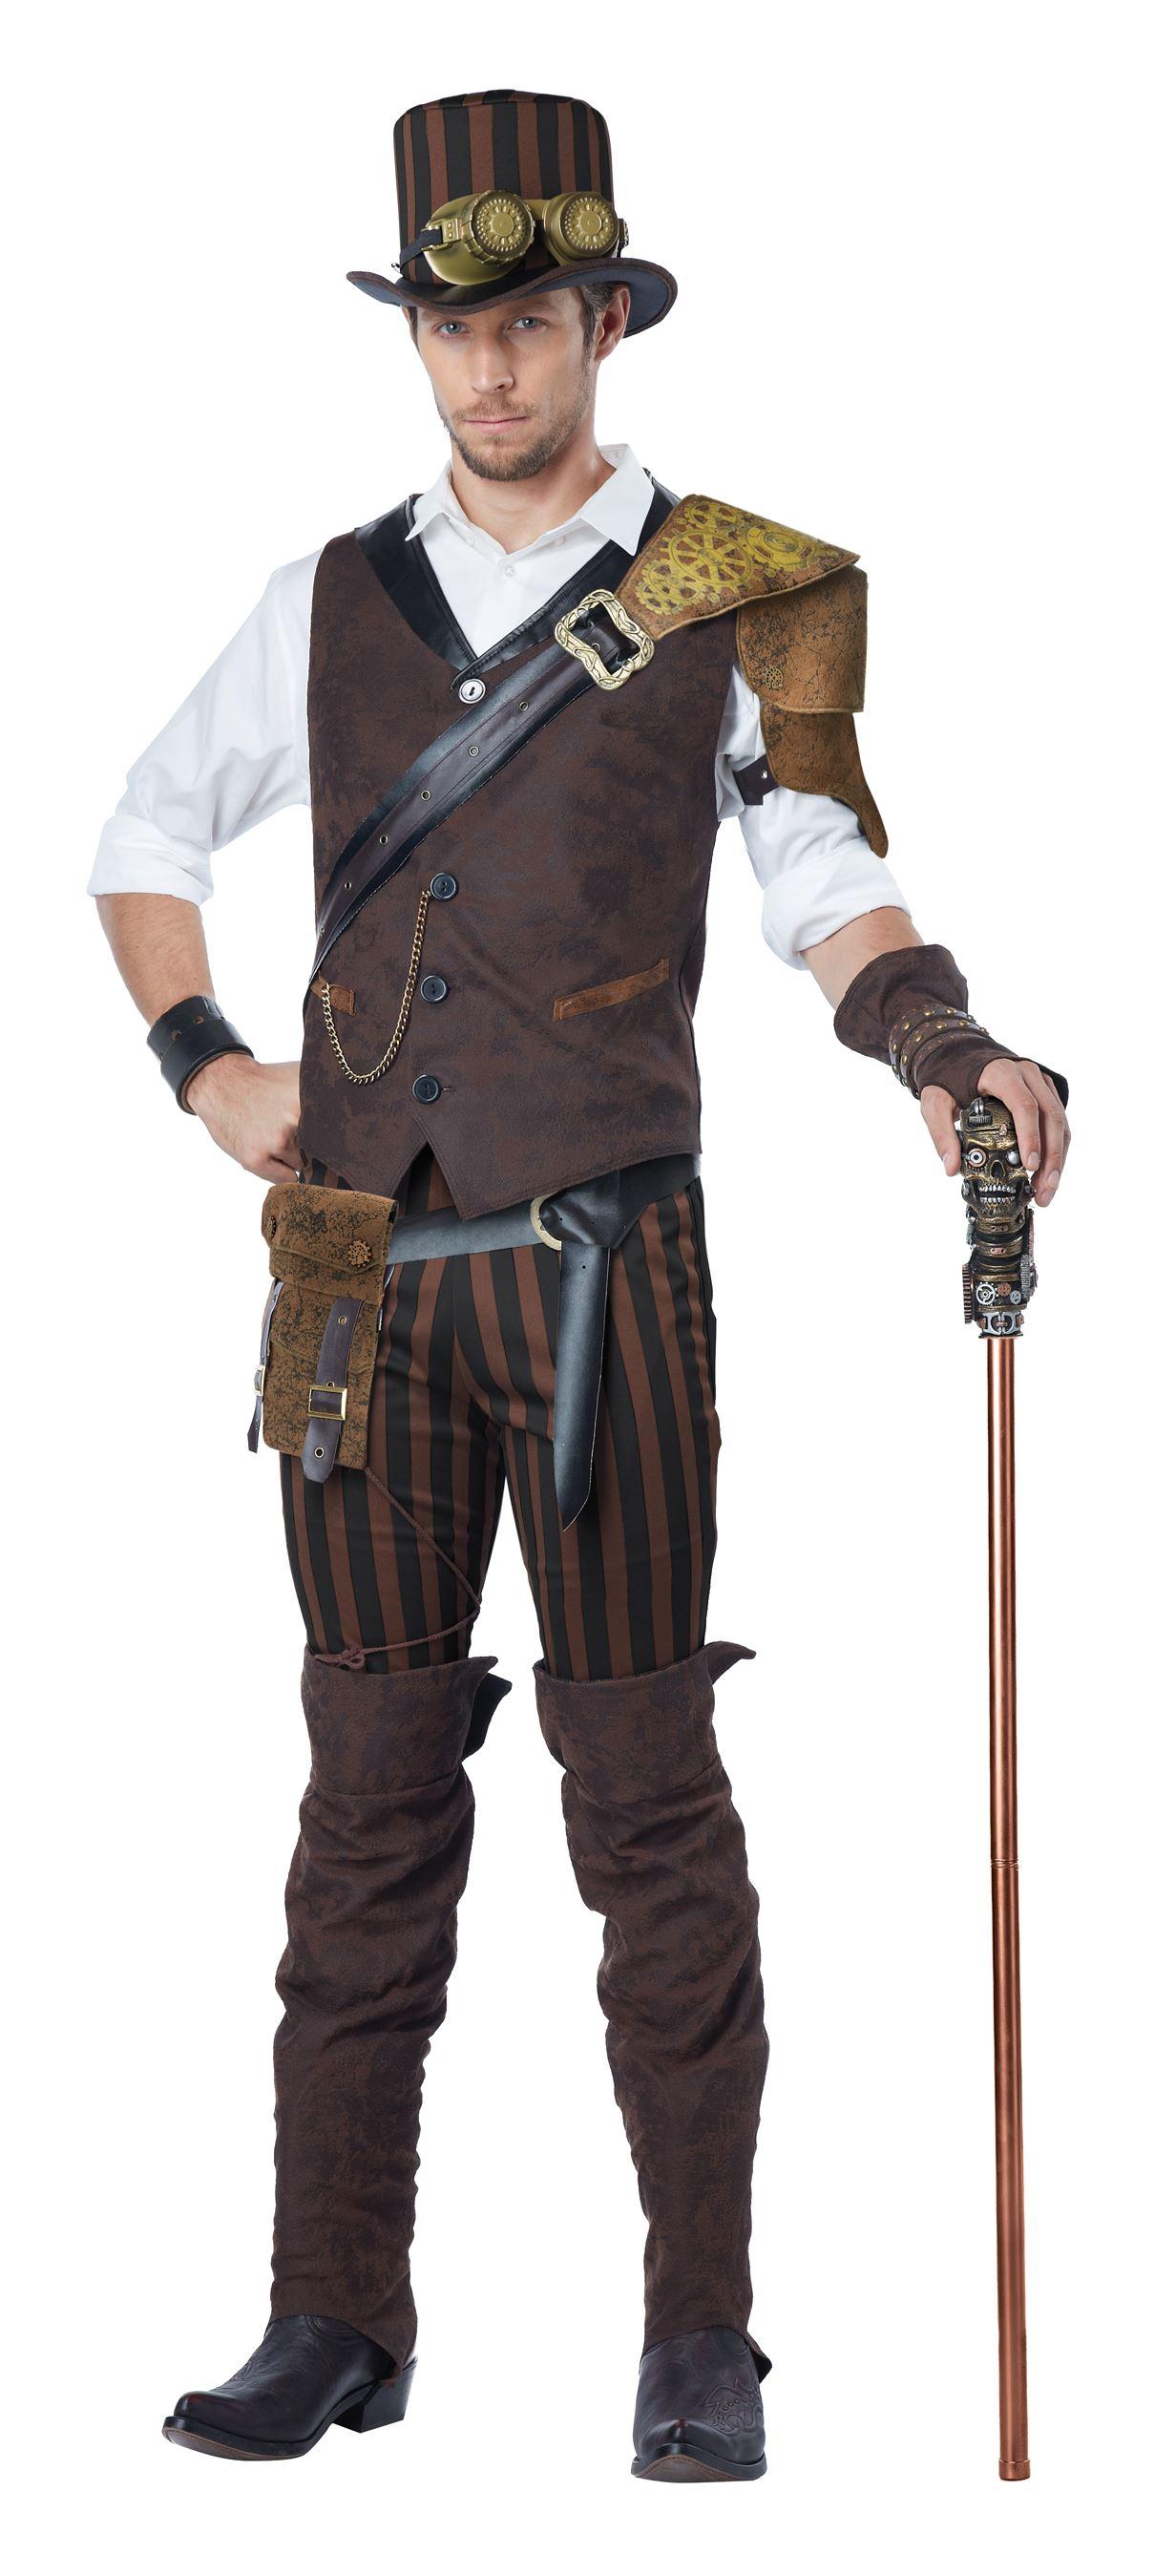 Steampunk Time Traveler Costume